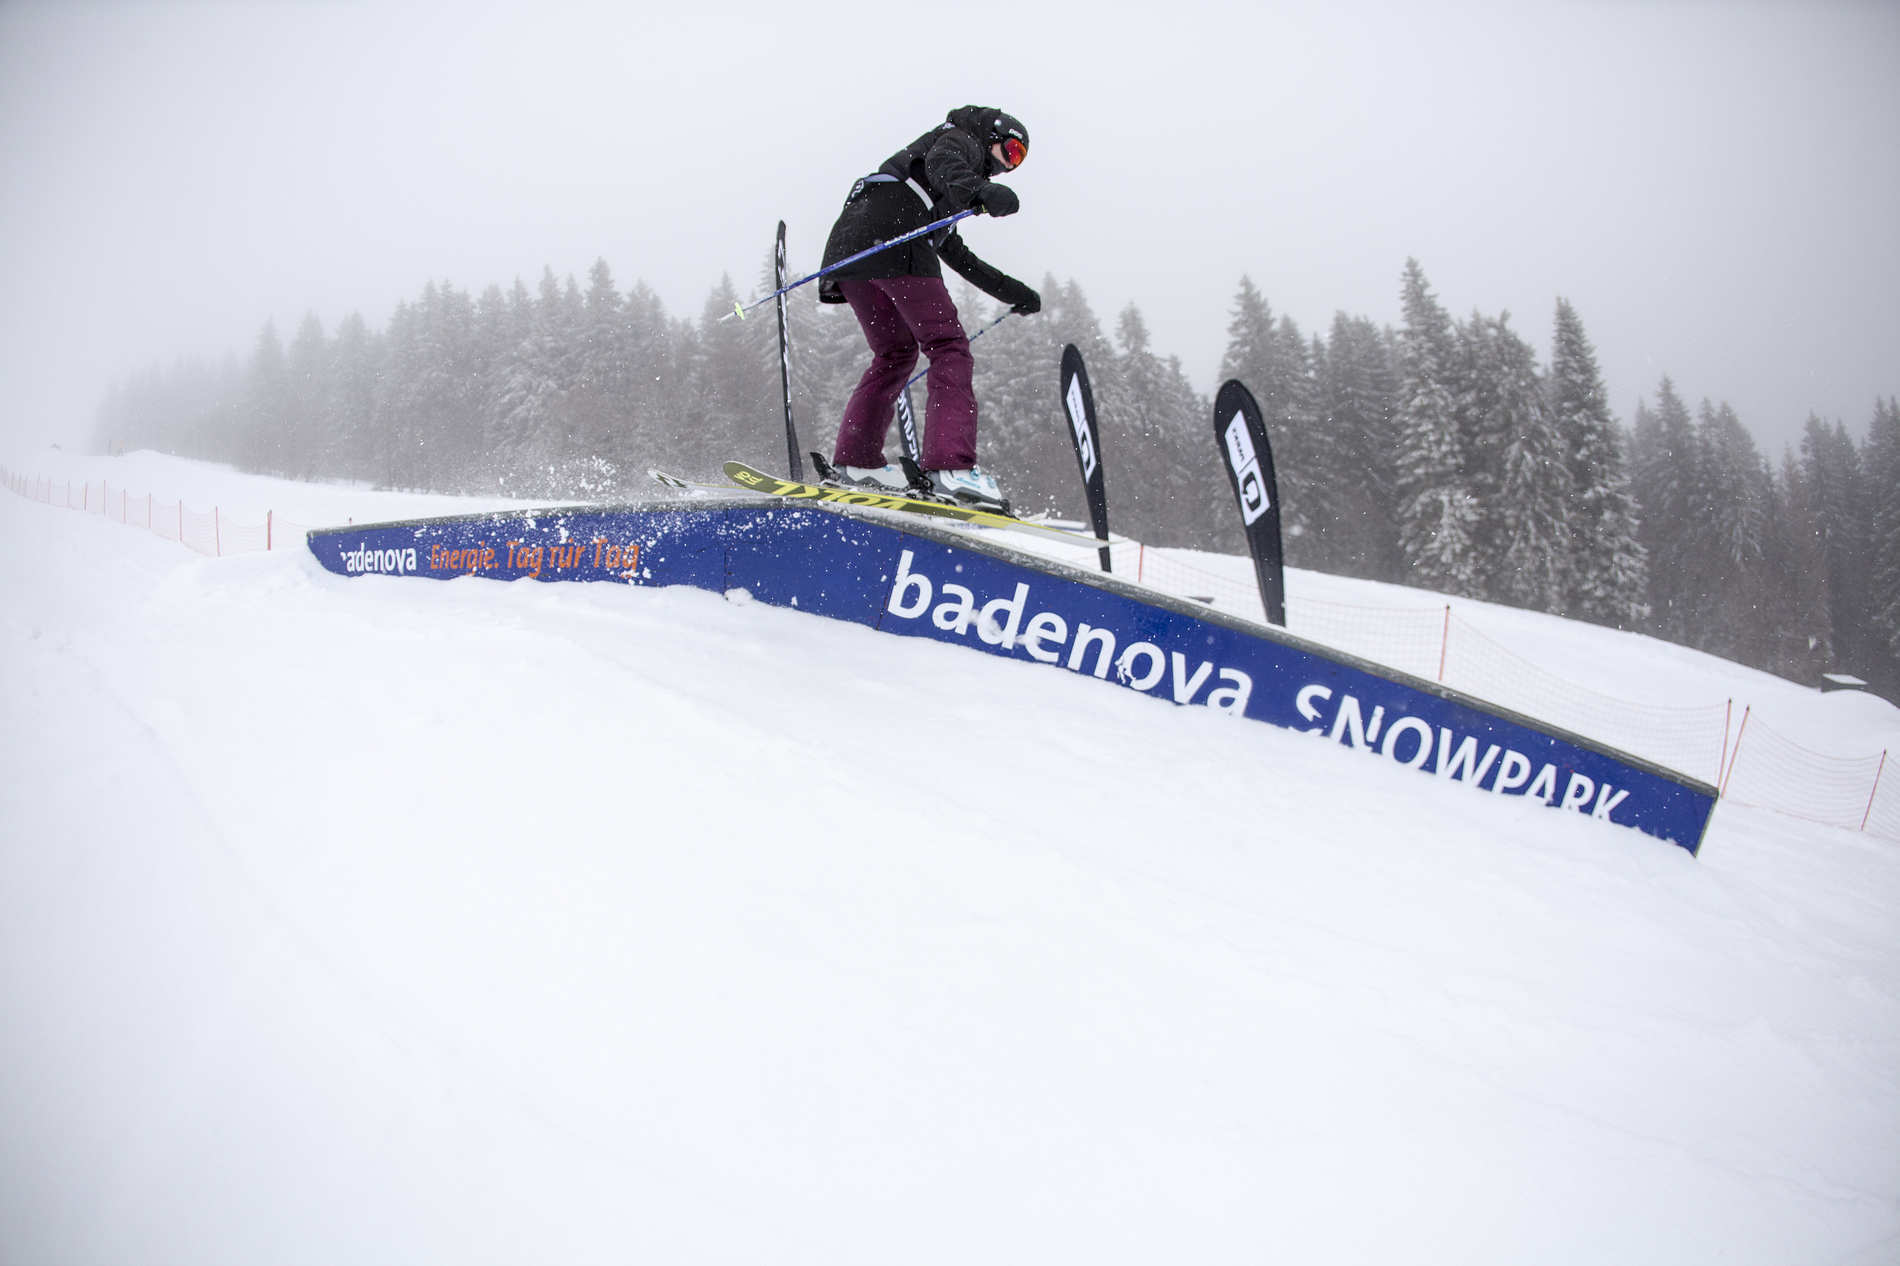 web snowpark feldberg 17 02 2018 action fs unknown martin herrmann qparks 24